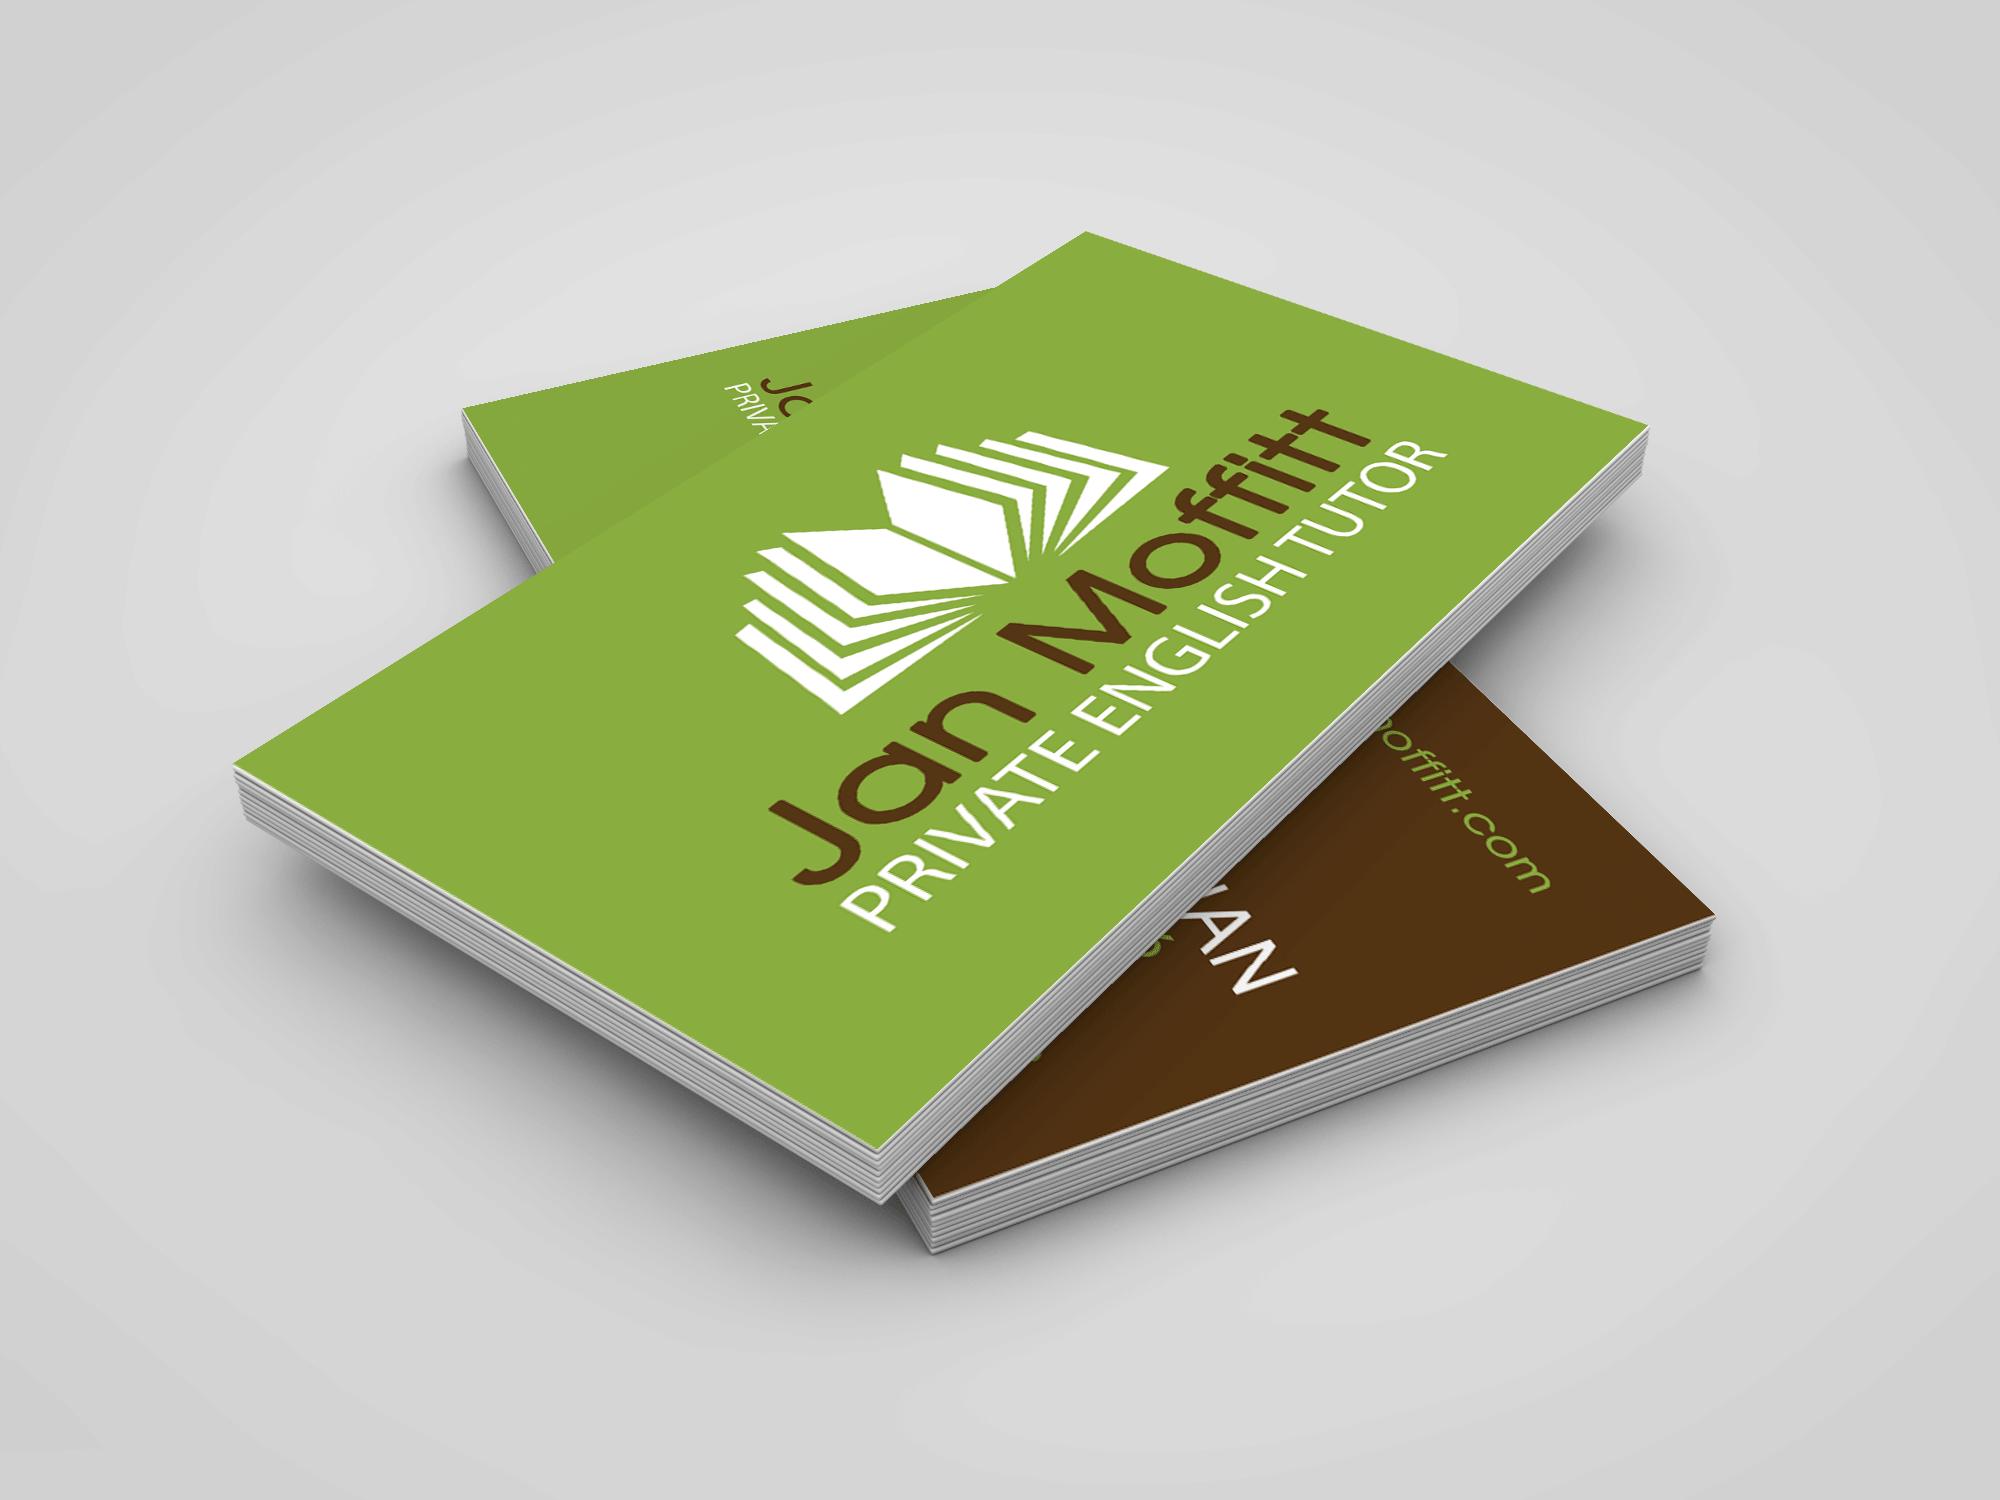 Tutoring business cards unlimitedgamers moffitt designs with tutoring business cards source moffittdesigns colourmoves